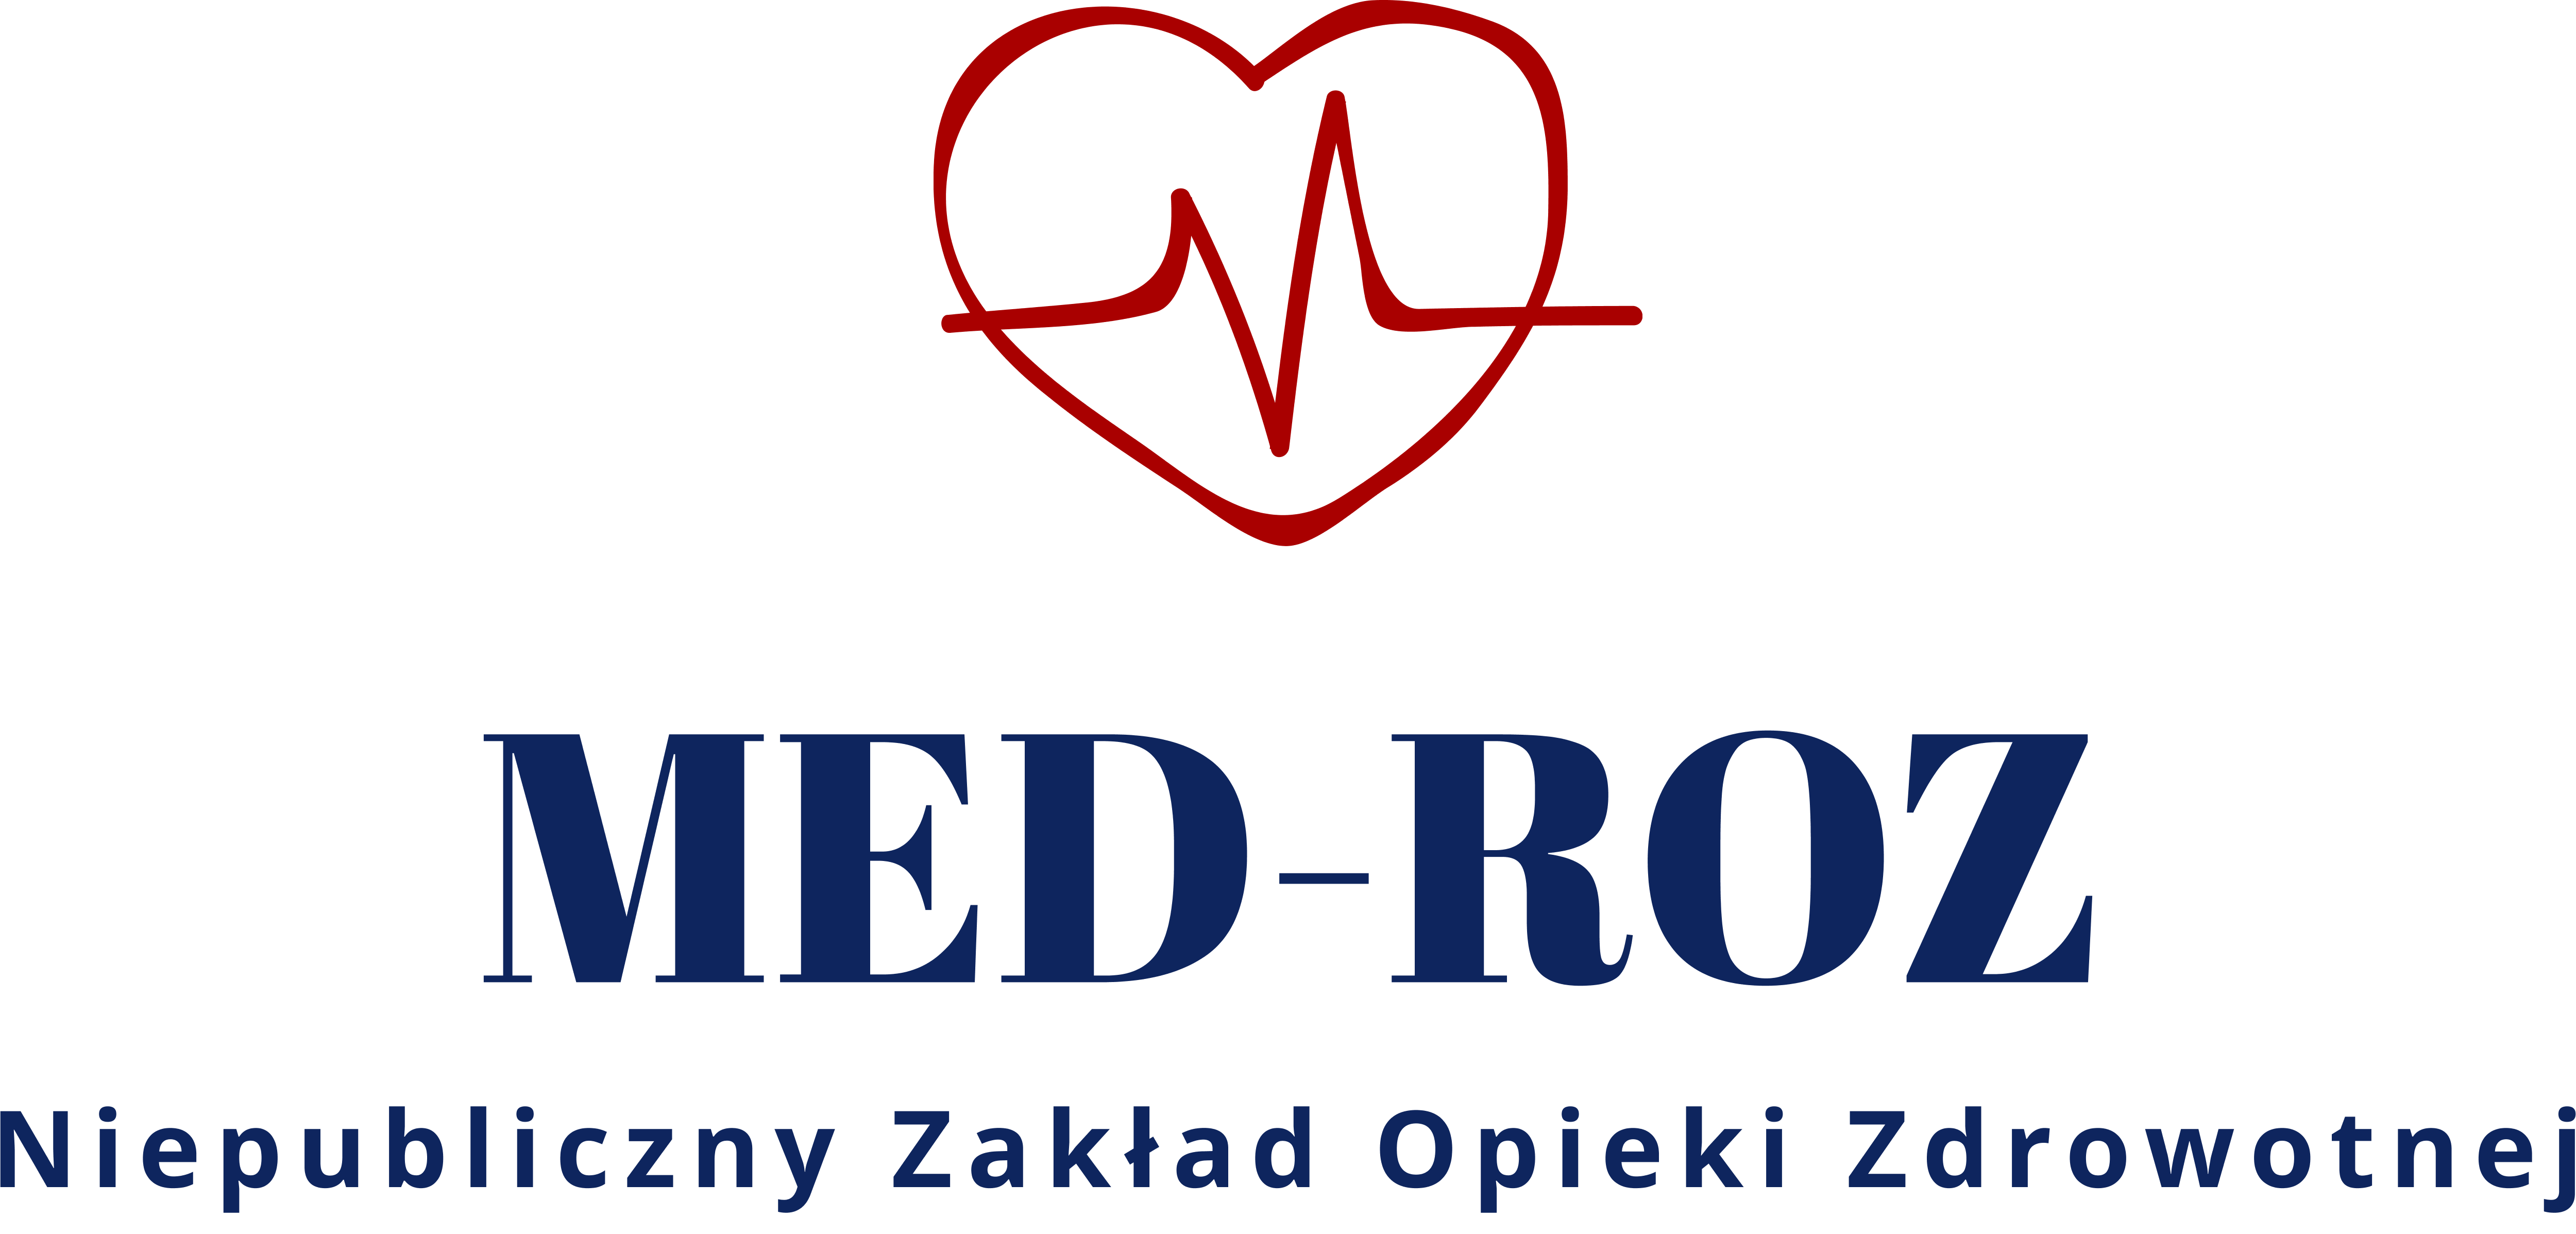 logo Med-roz